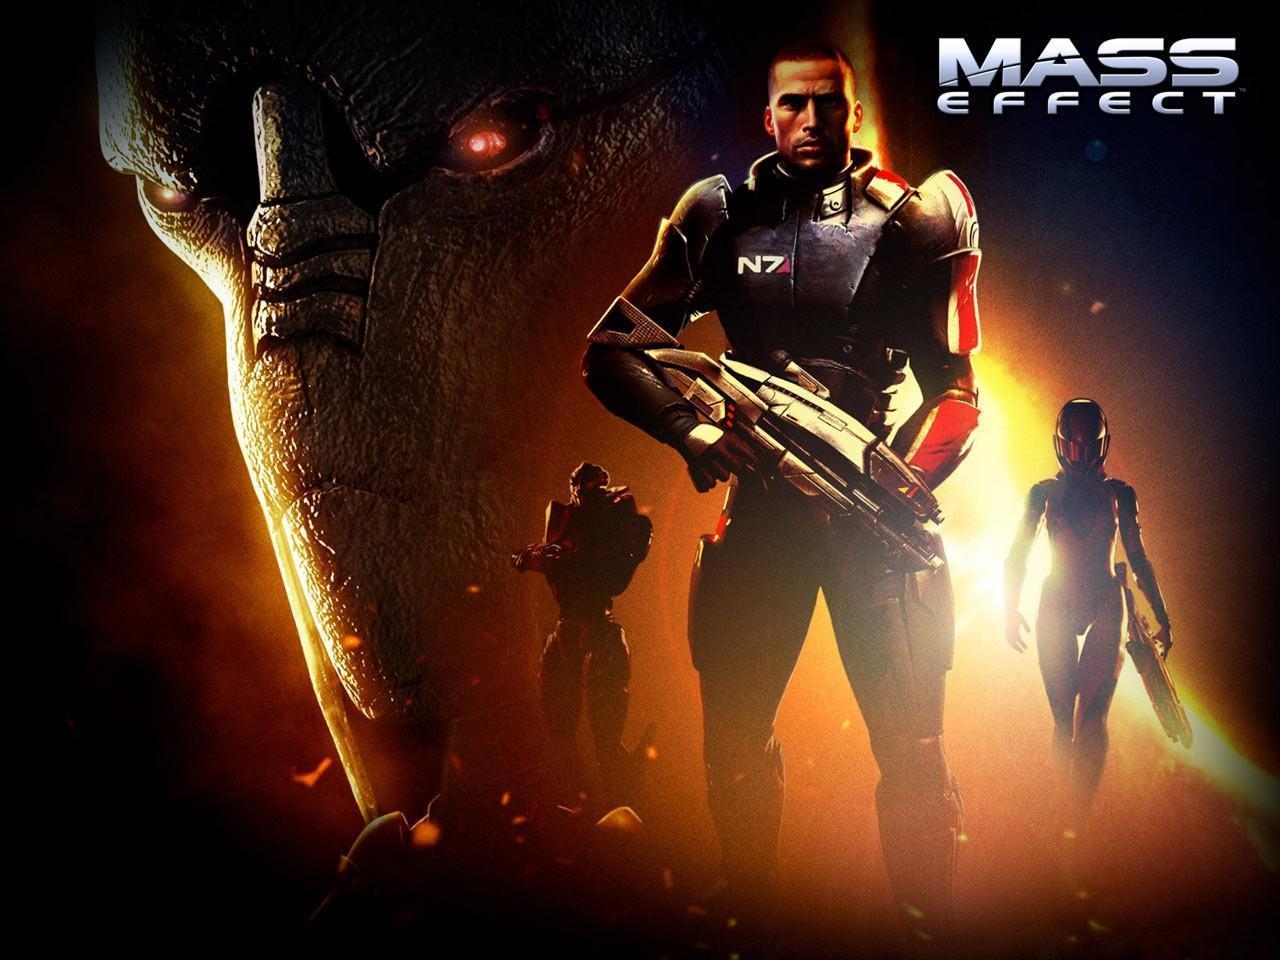 Mass effect 2 face generator celebrity